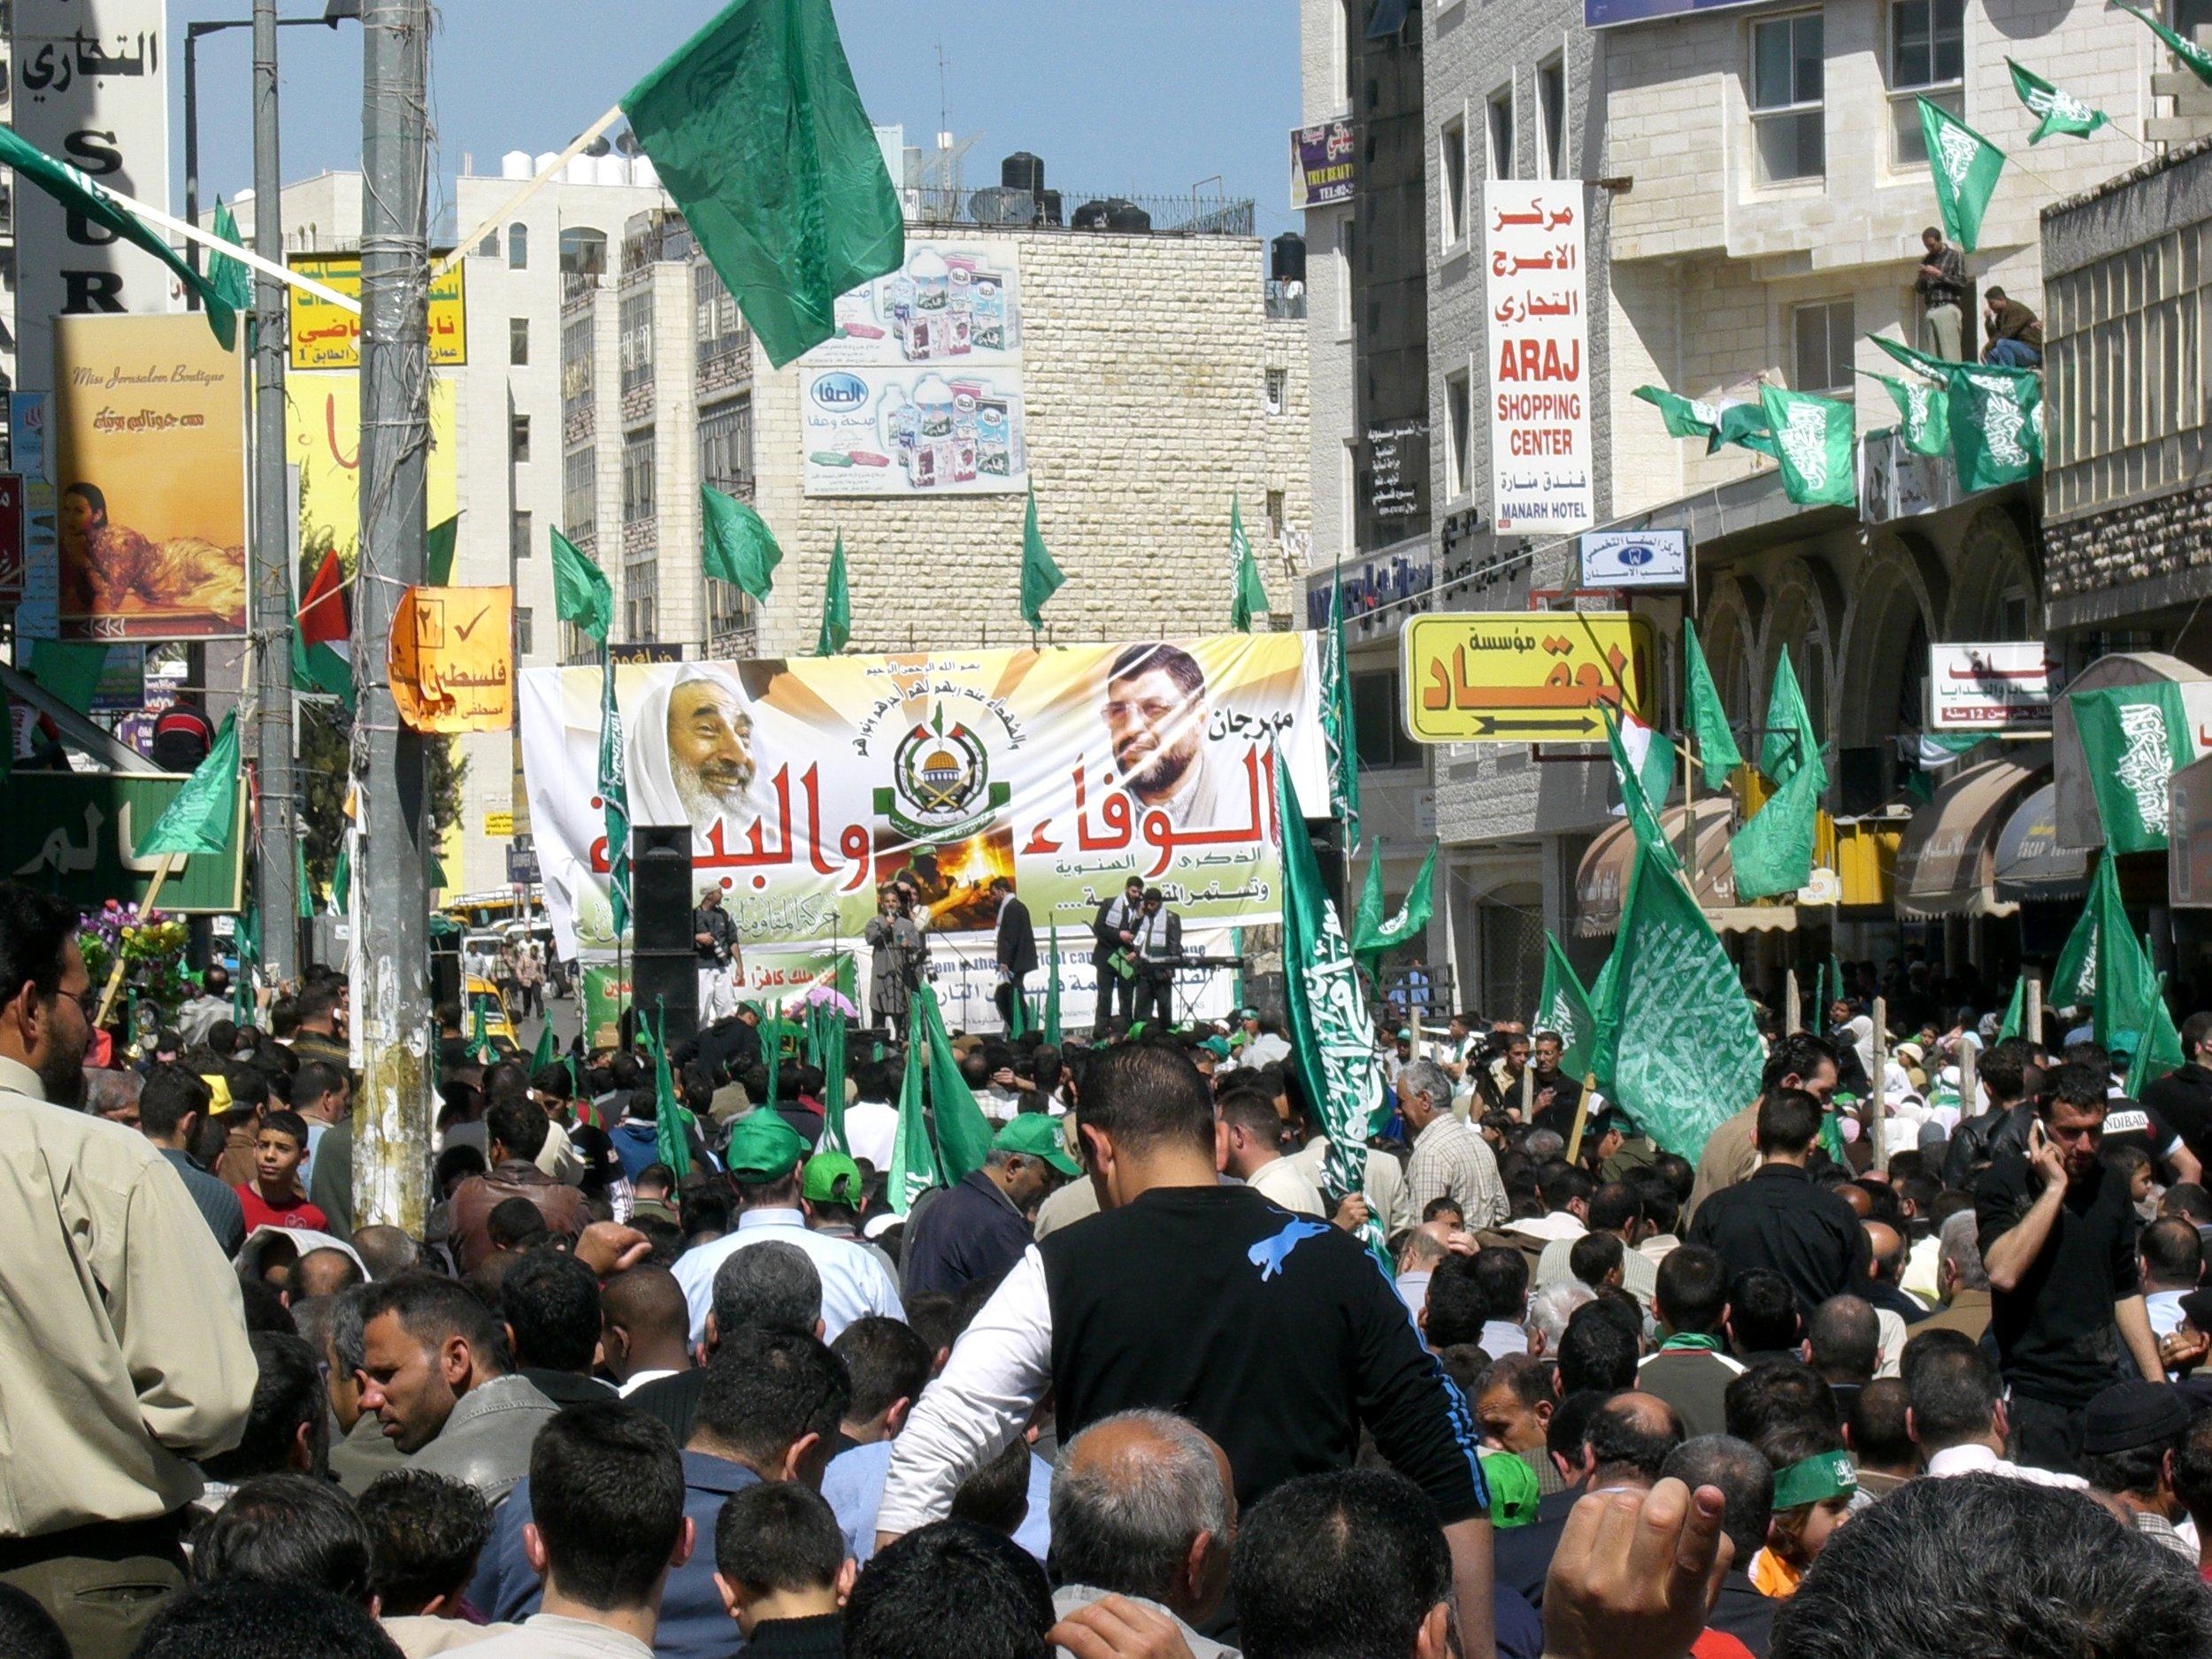 A pro-Hamas rally in Ramallah. Credit: Wikimedia Commons.